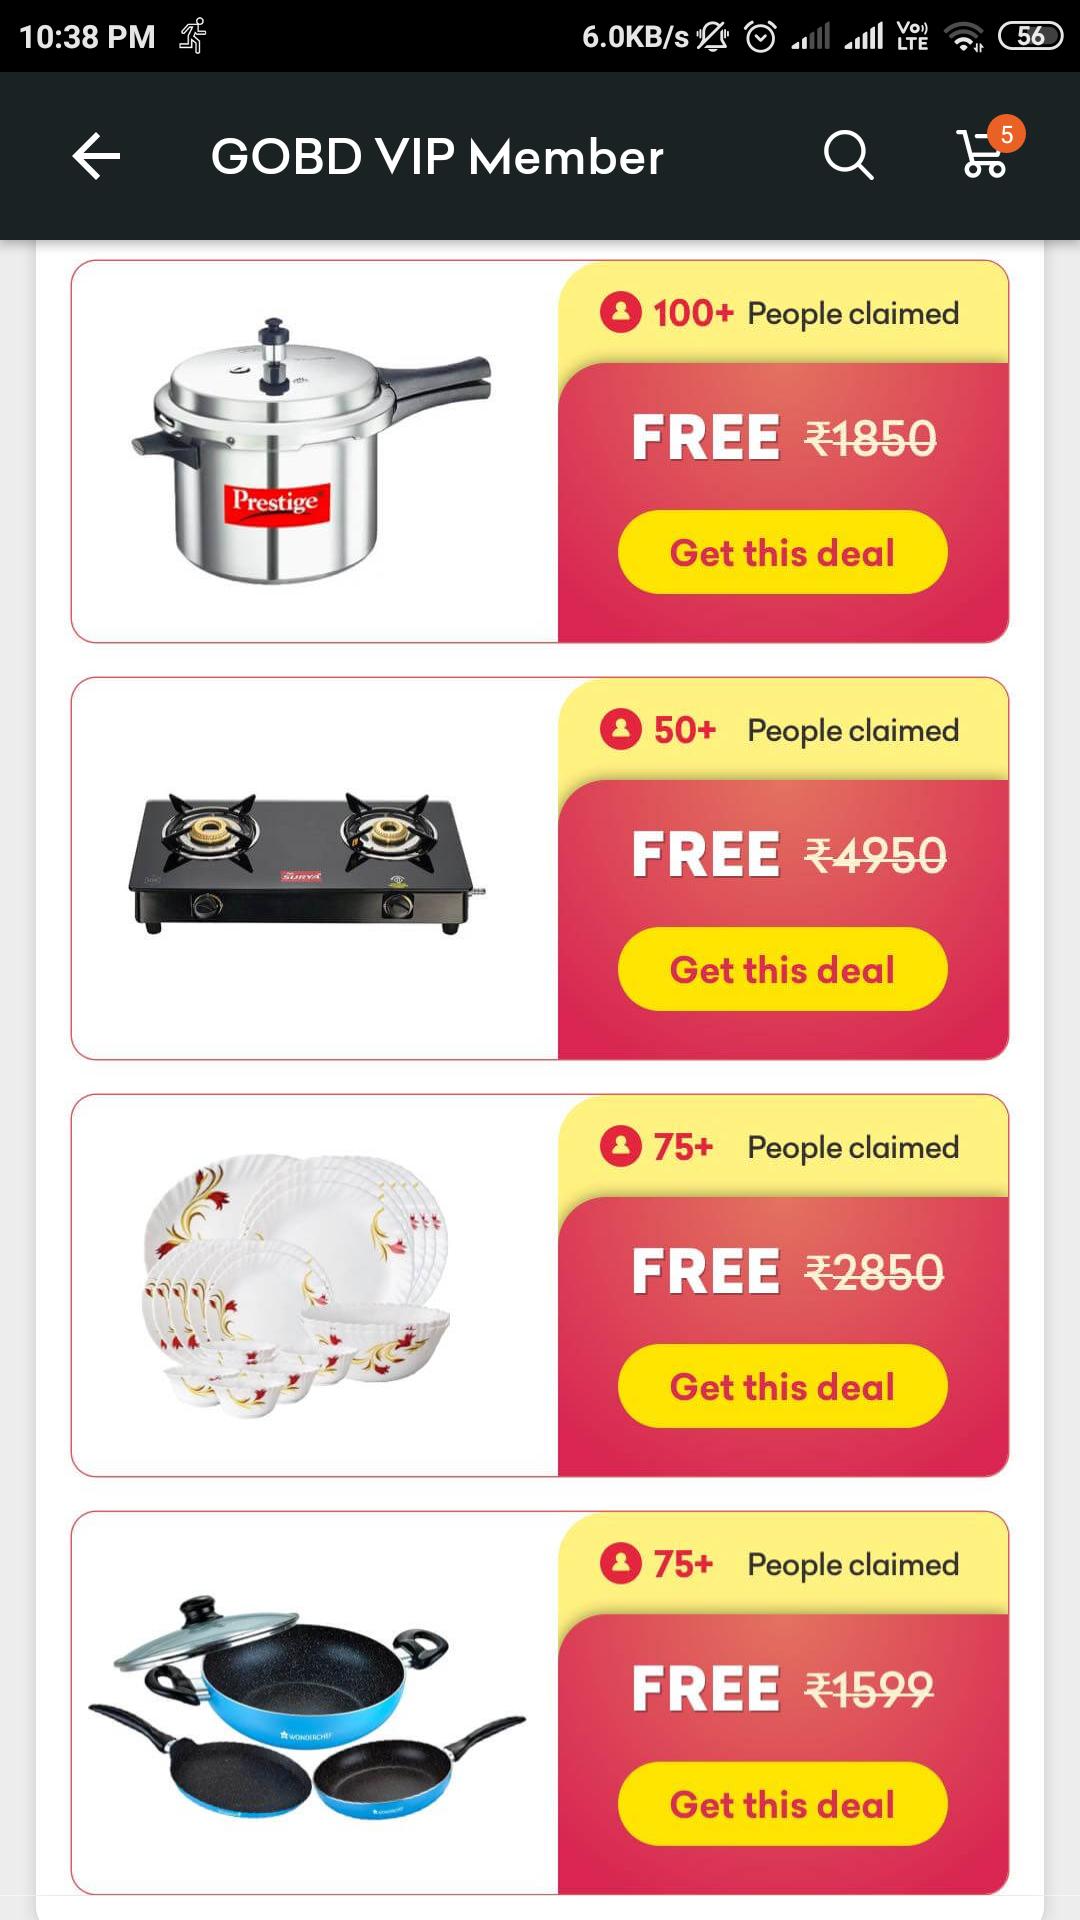 https://cdn0.desidime.com/attachments/photos/577570/original/Screenshot_2019-07-26-22-38-55-955_com.grofers.customerapp.png?1564161187